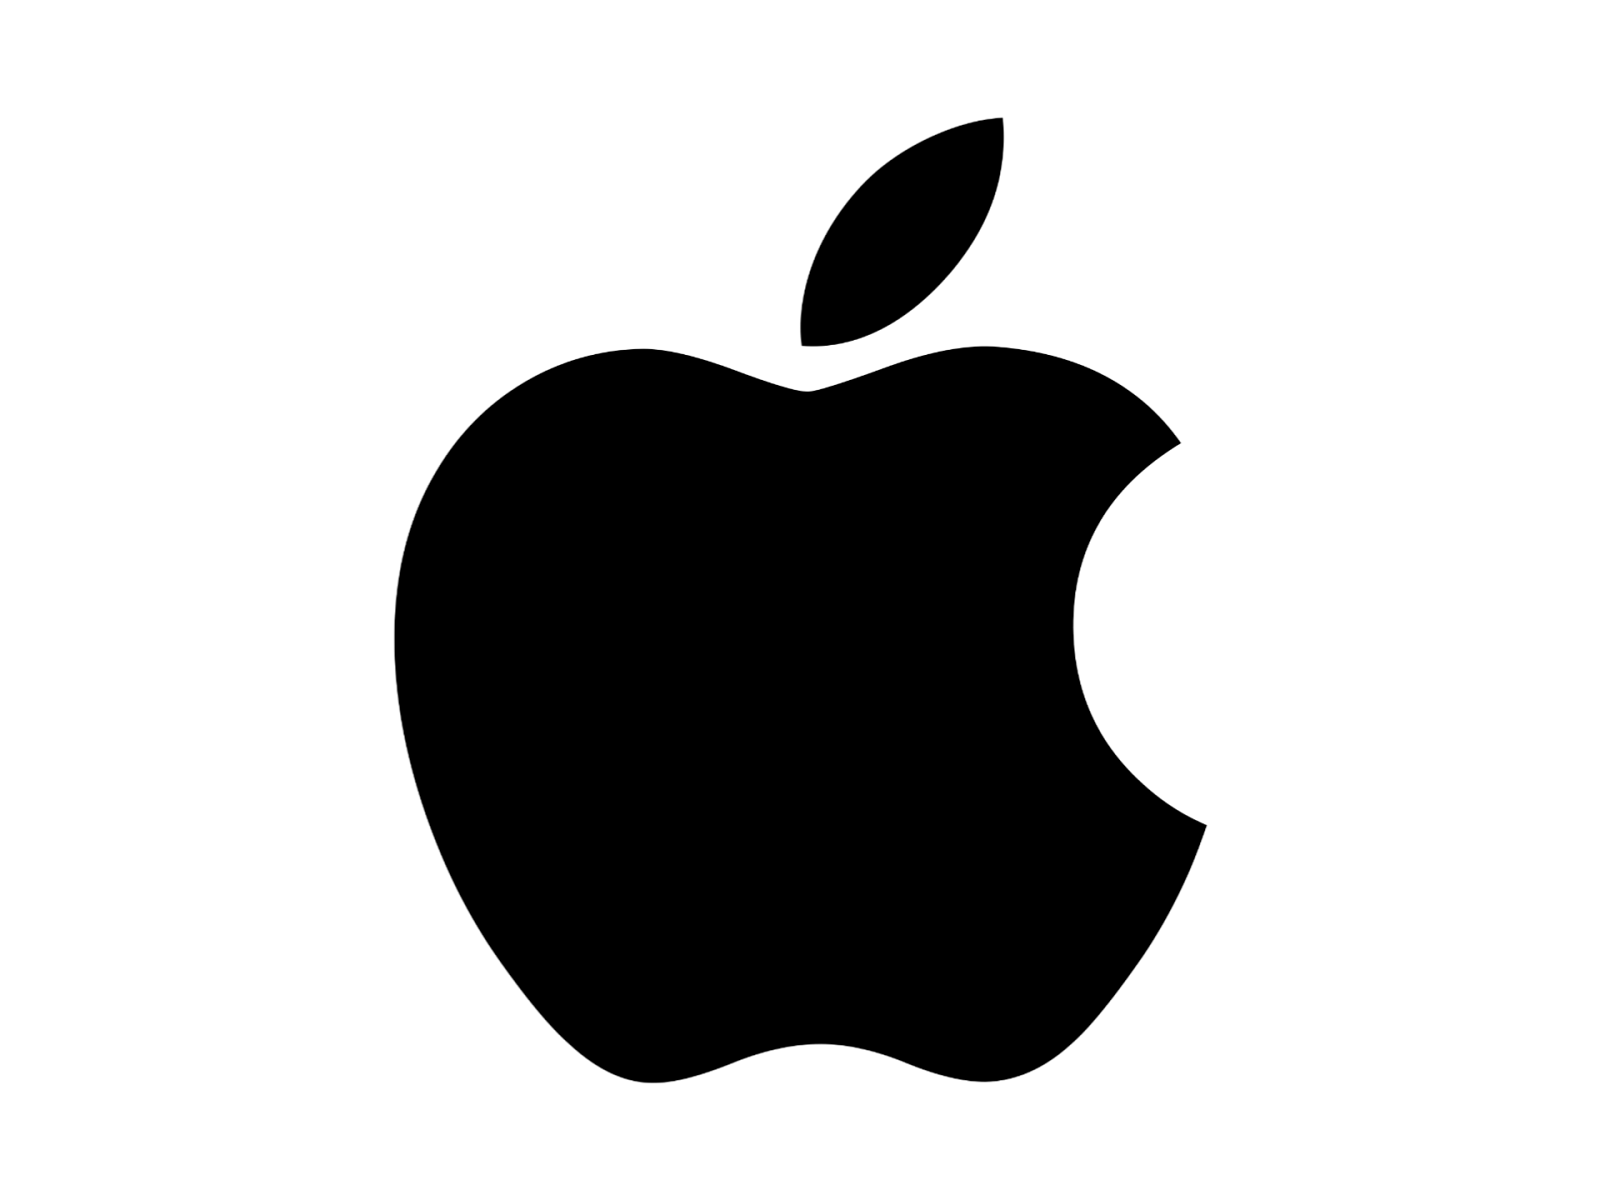 Logo iPhone Format PNG